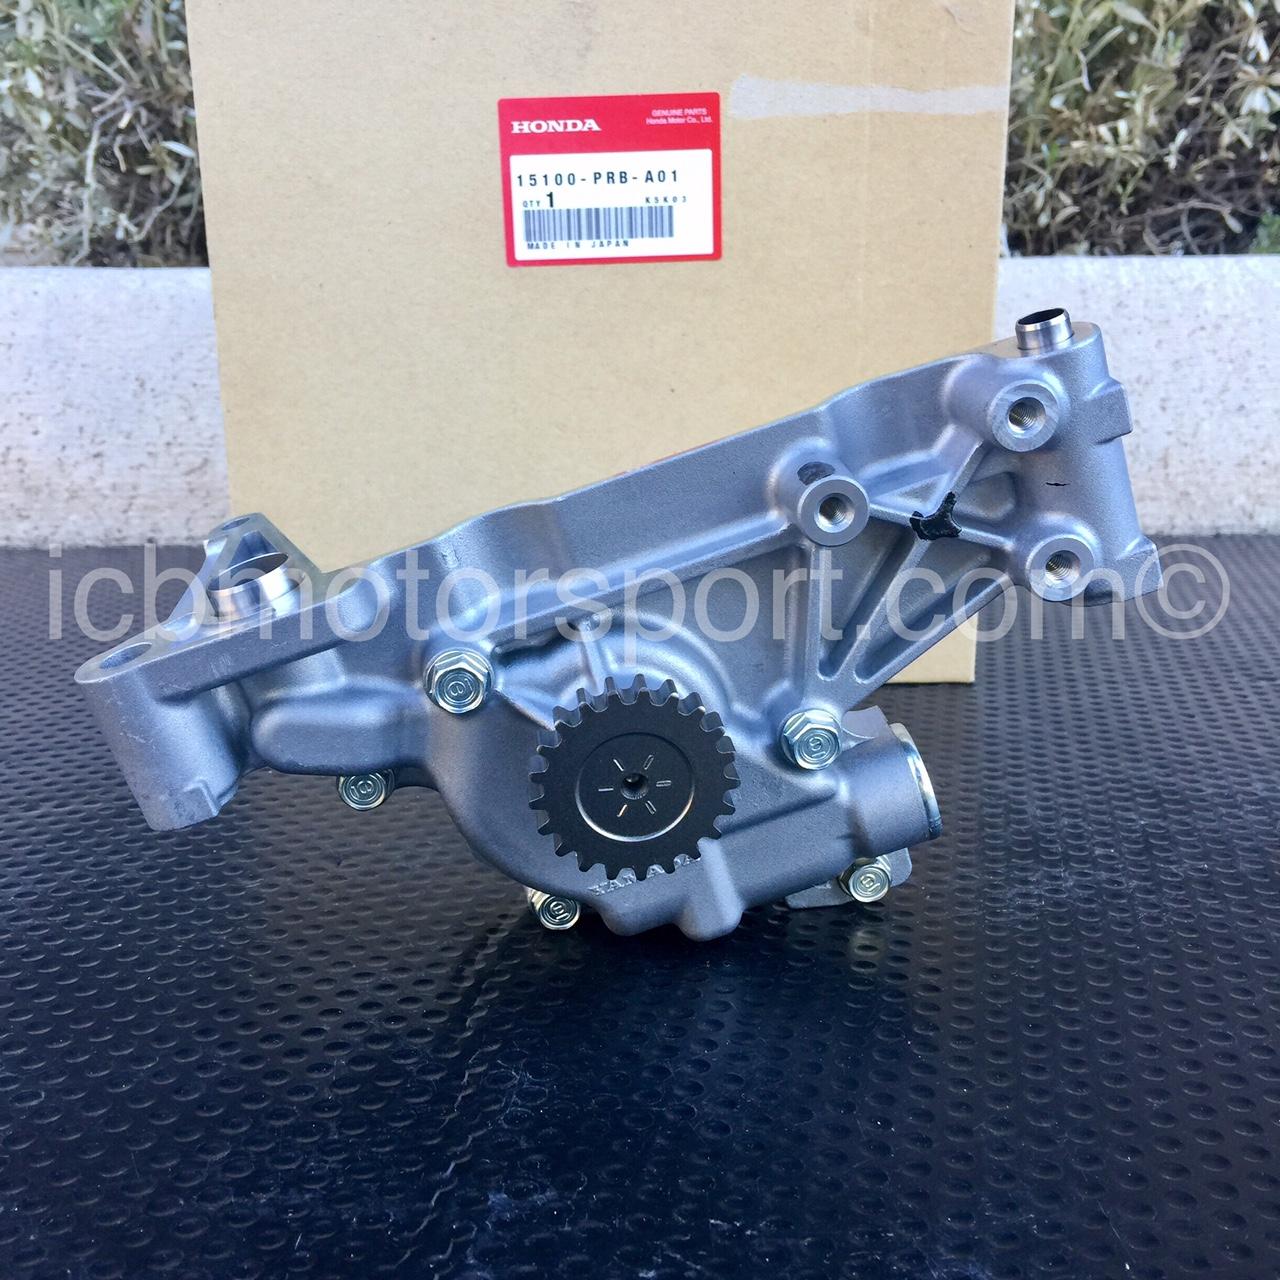 USDM DC5 Acura RSX 02-06 PRB Oil Pump 15100-PRB-A01